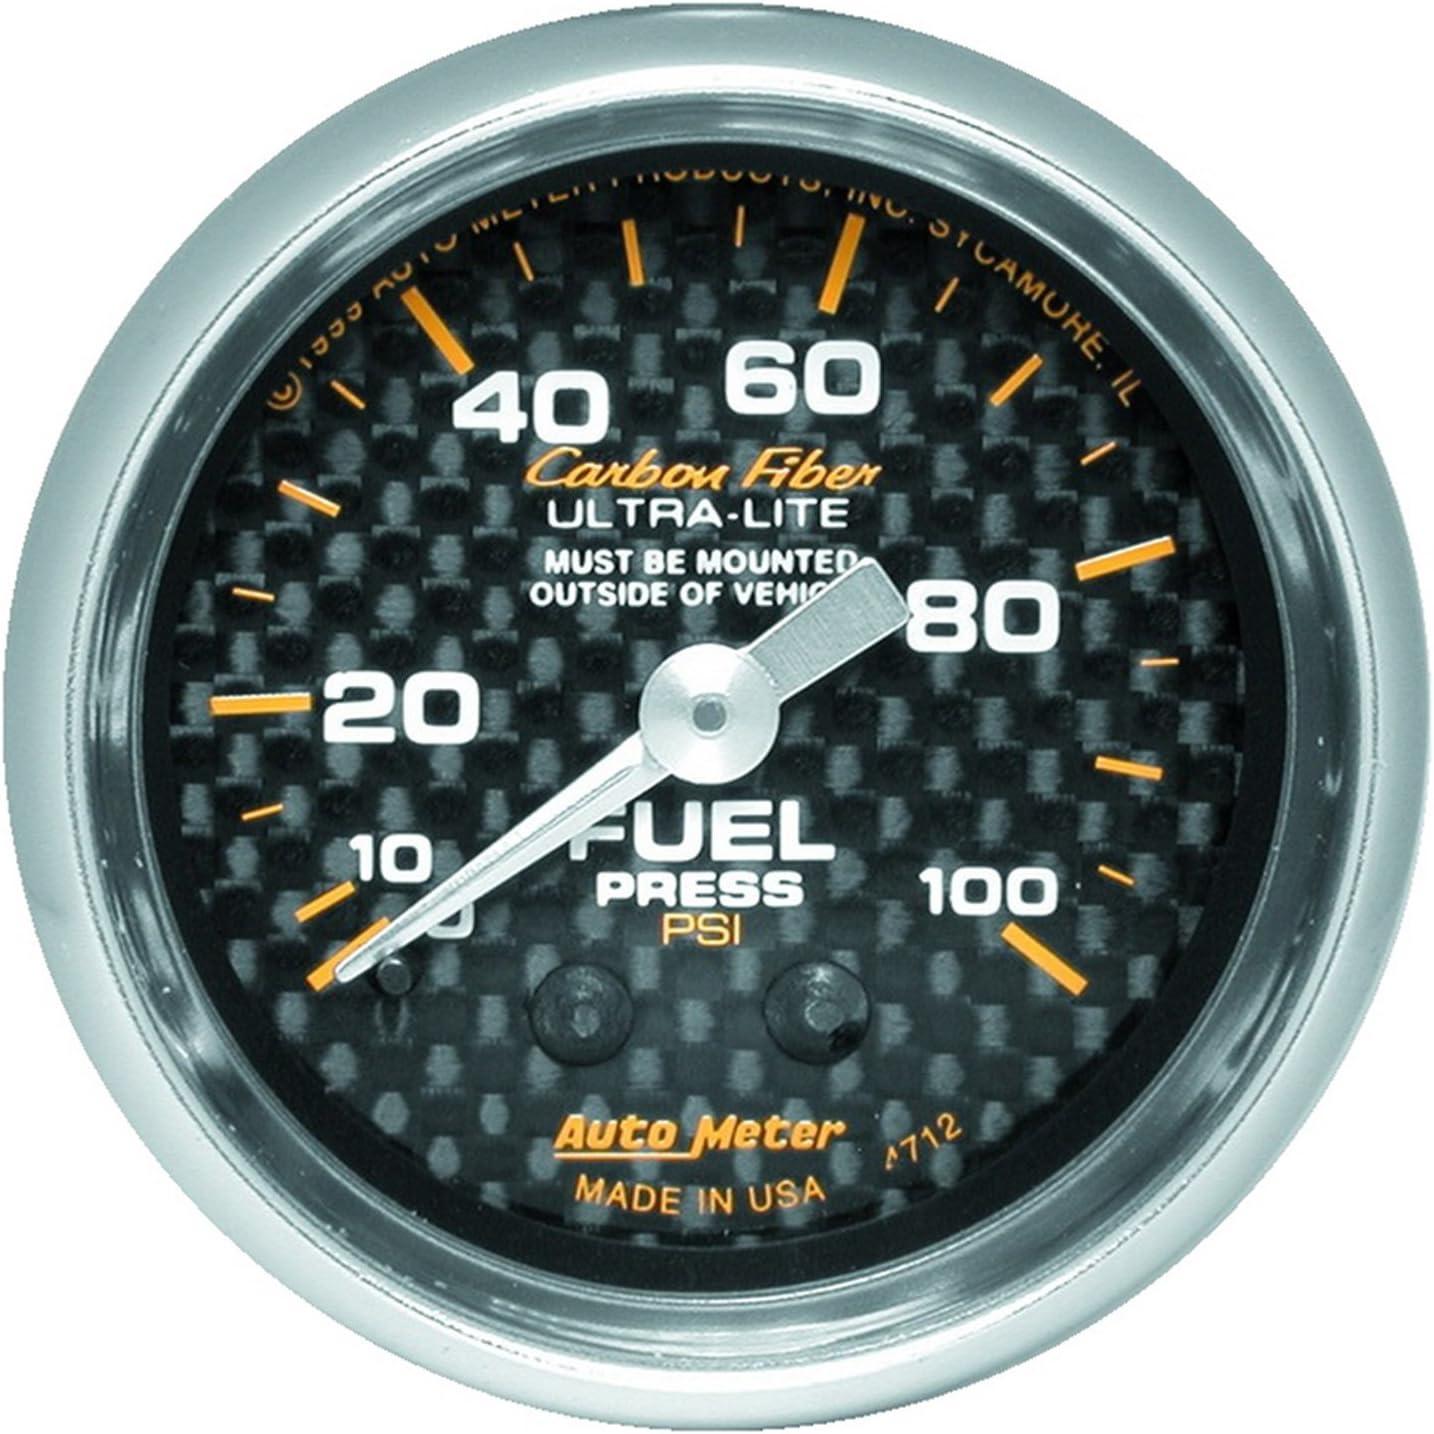 AUTO METER 4712 Carbon Fiber 超定番 Mechanical Gauge Pressure Fuel 予約